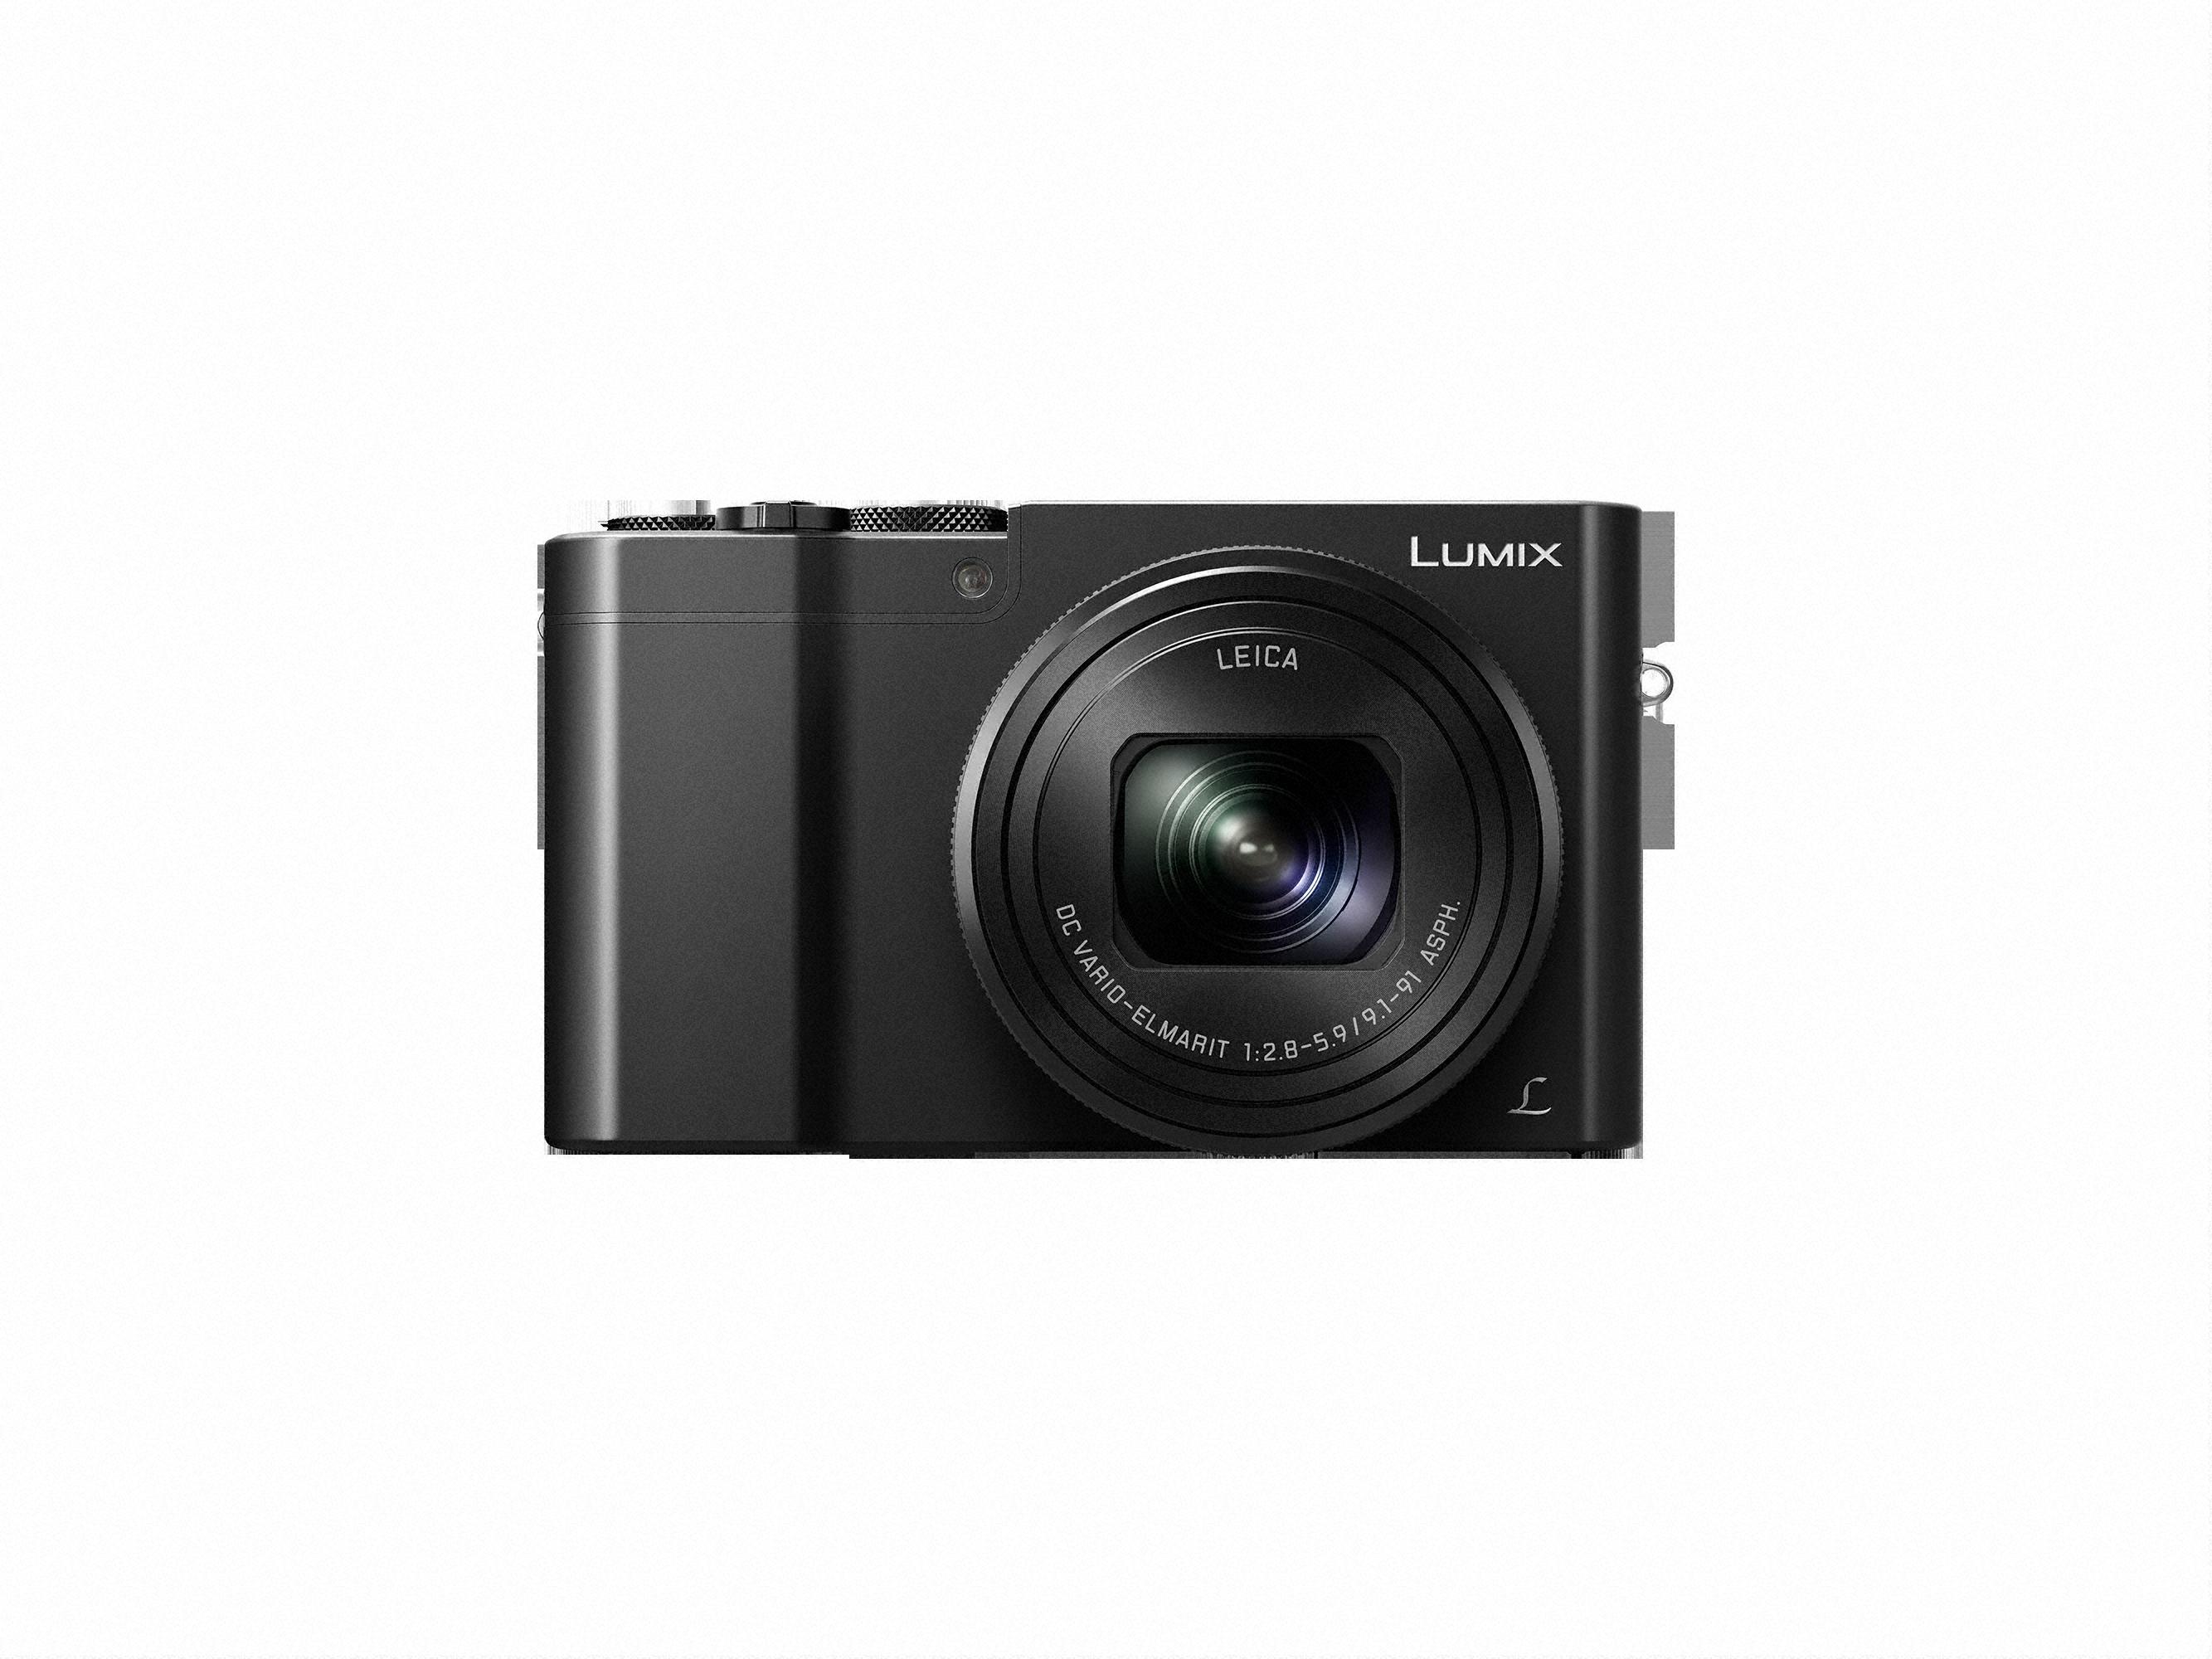 Appareil photo compact - Lumix TZ100 noir